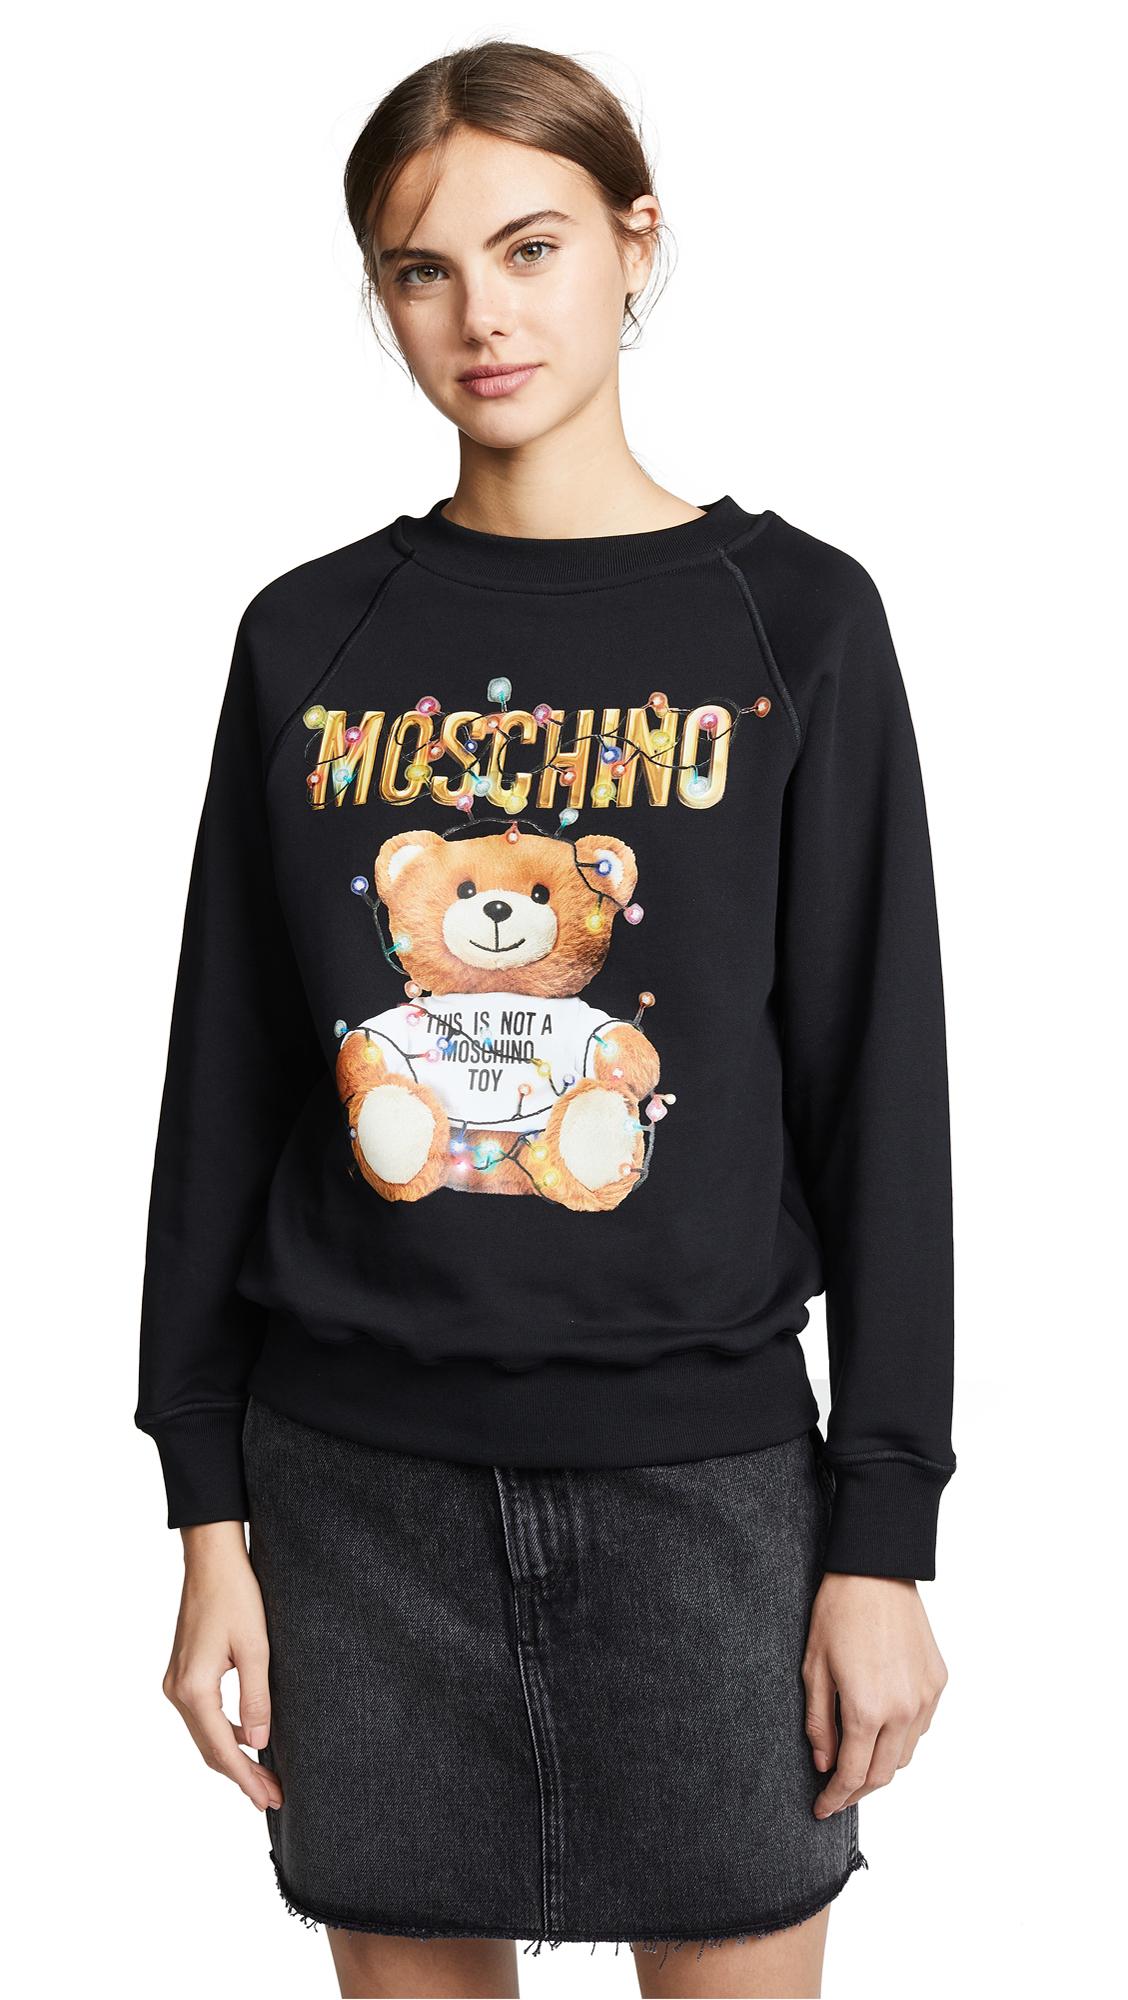 Moschino Christmas Lights Bear Sweatshirt - Black